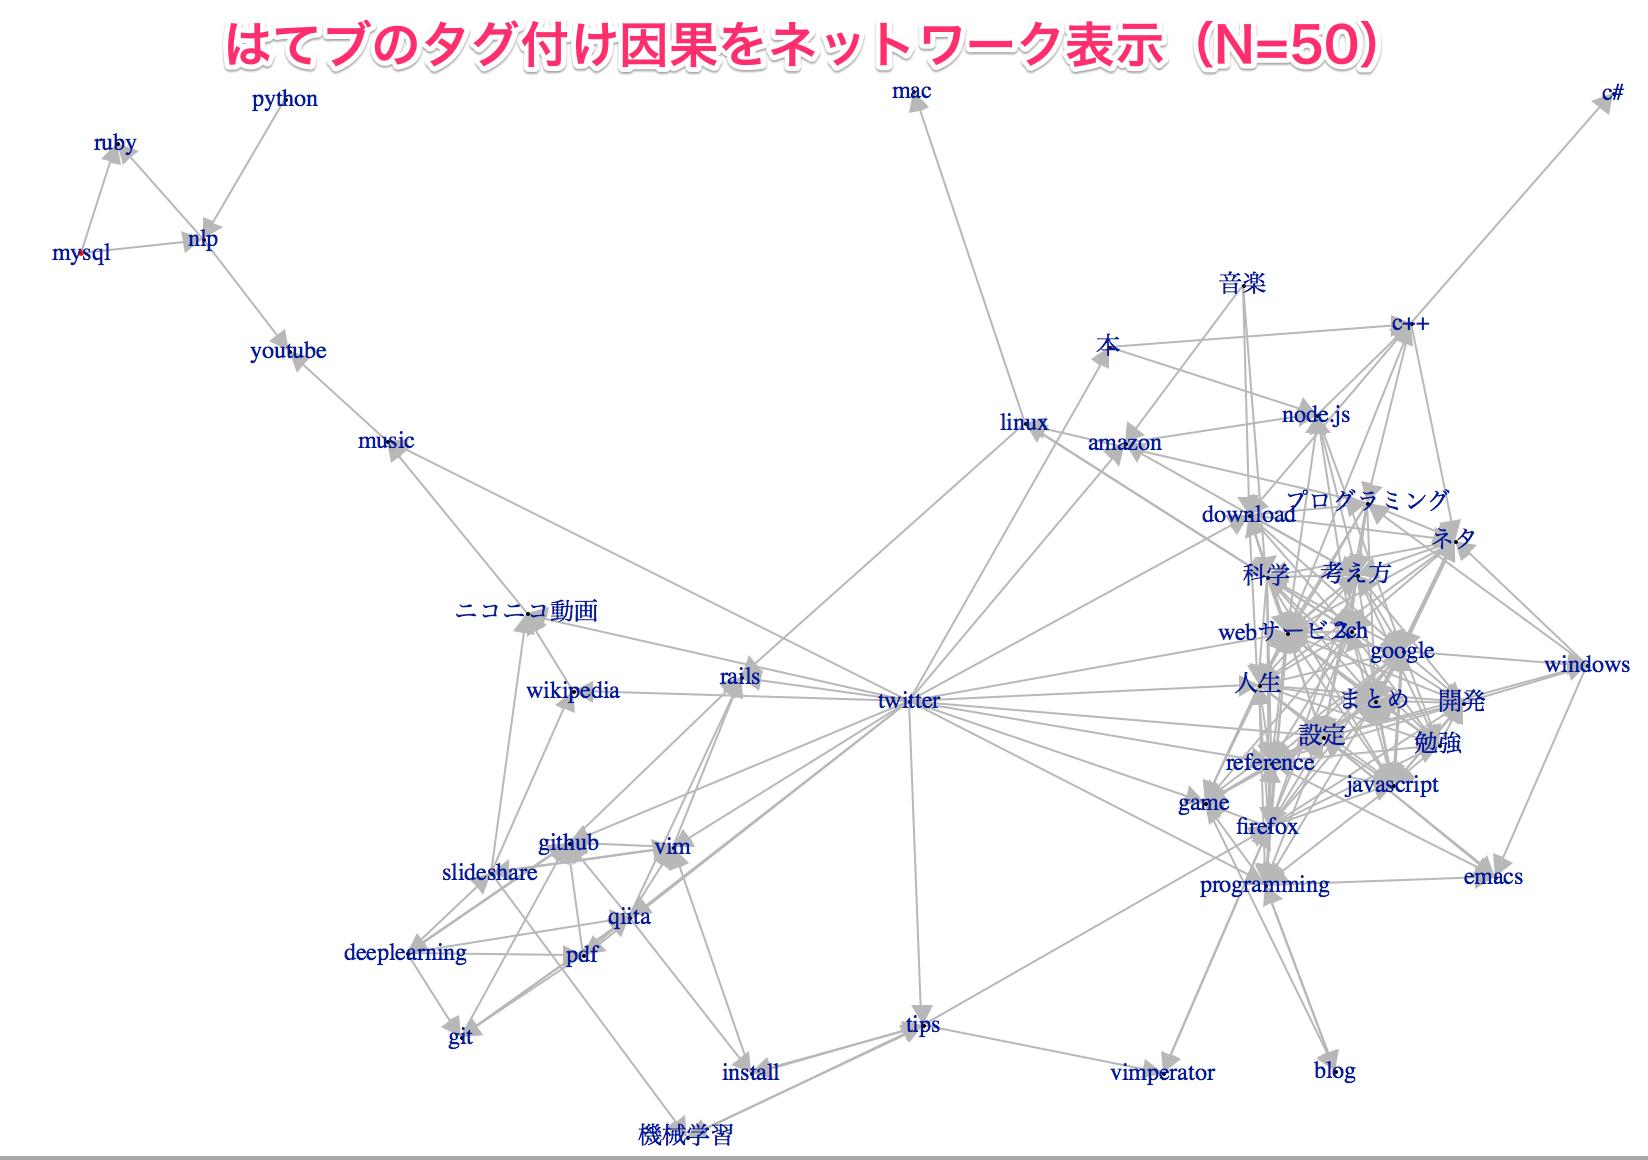 https://github.com/KenshoFujisaki/AnalyseHatenaBookmarkTagSeries/raw/master/img/granger_small.png